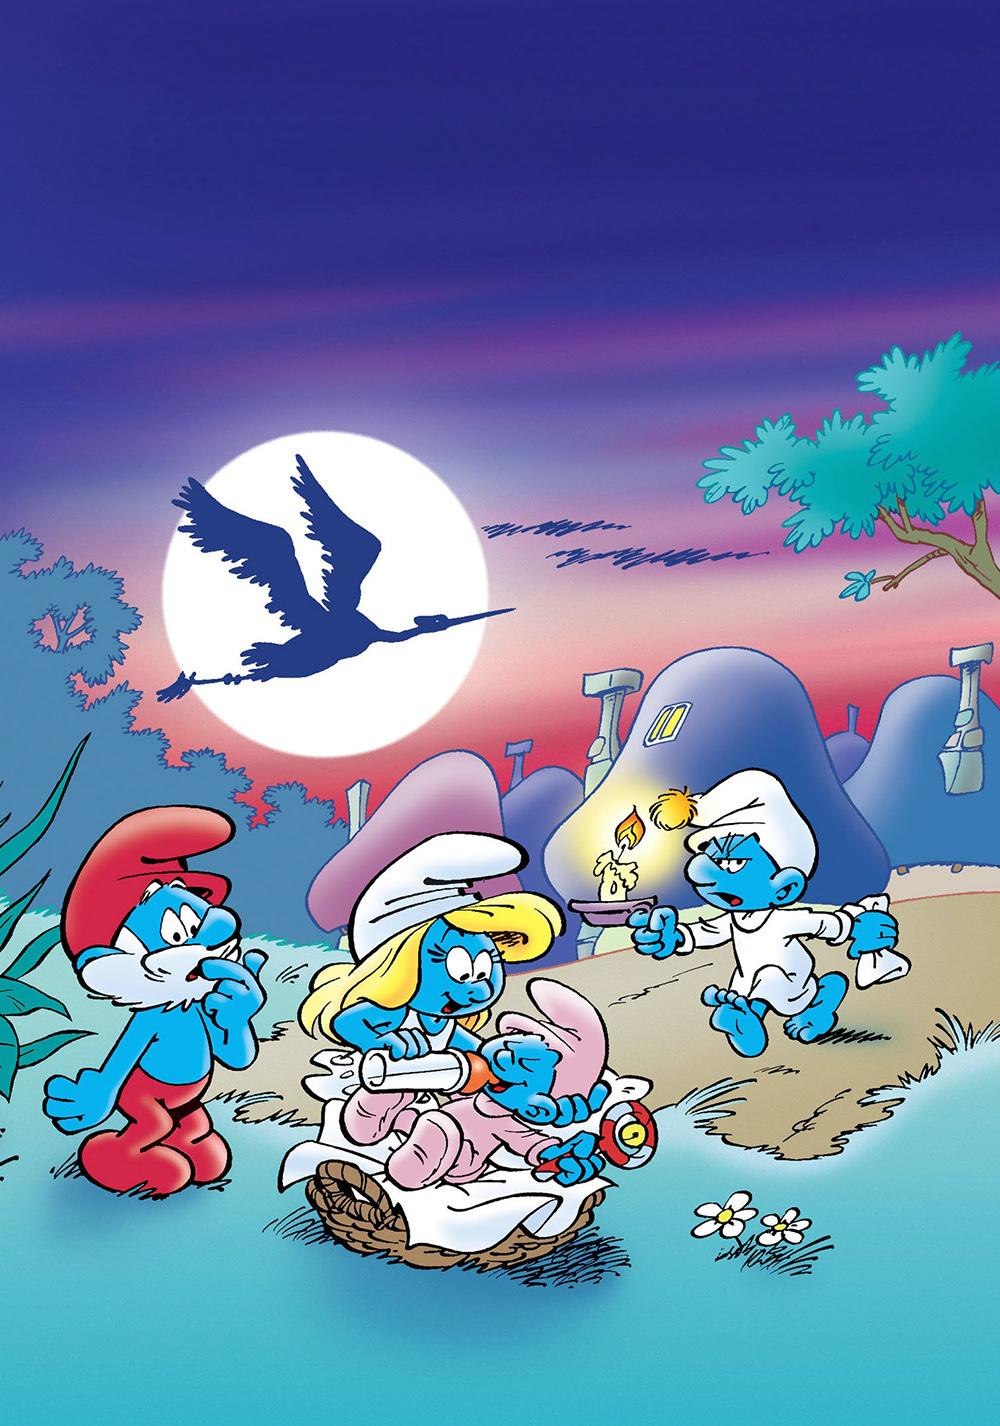 The Smurfs (TV Series 1981-1990) (S01) 128Kbps 23Fps DD+ 2Ch TR NF Audio SHS